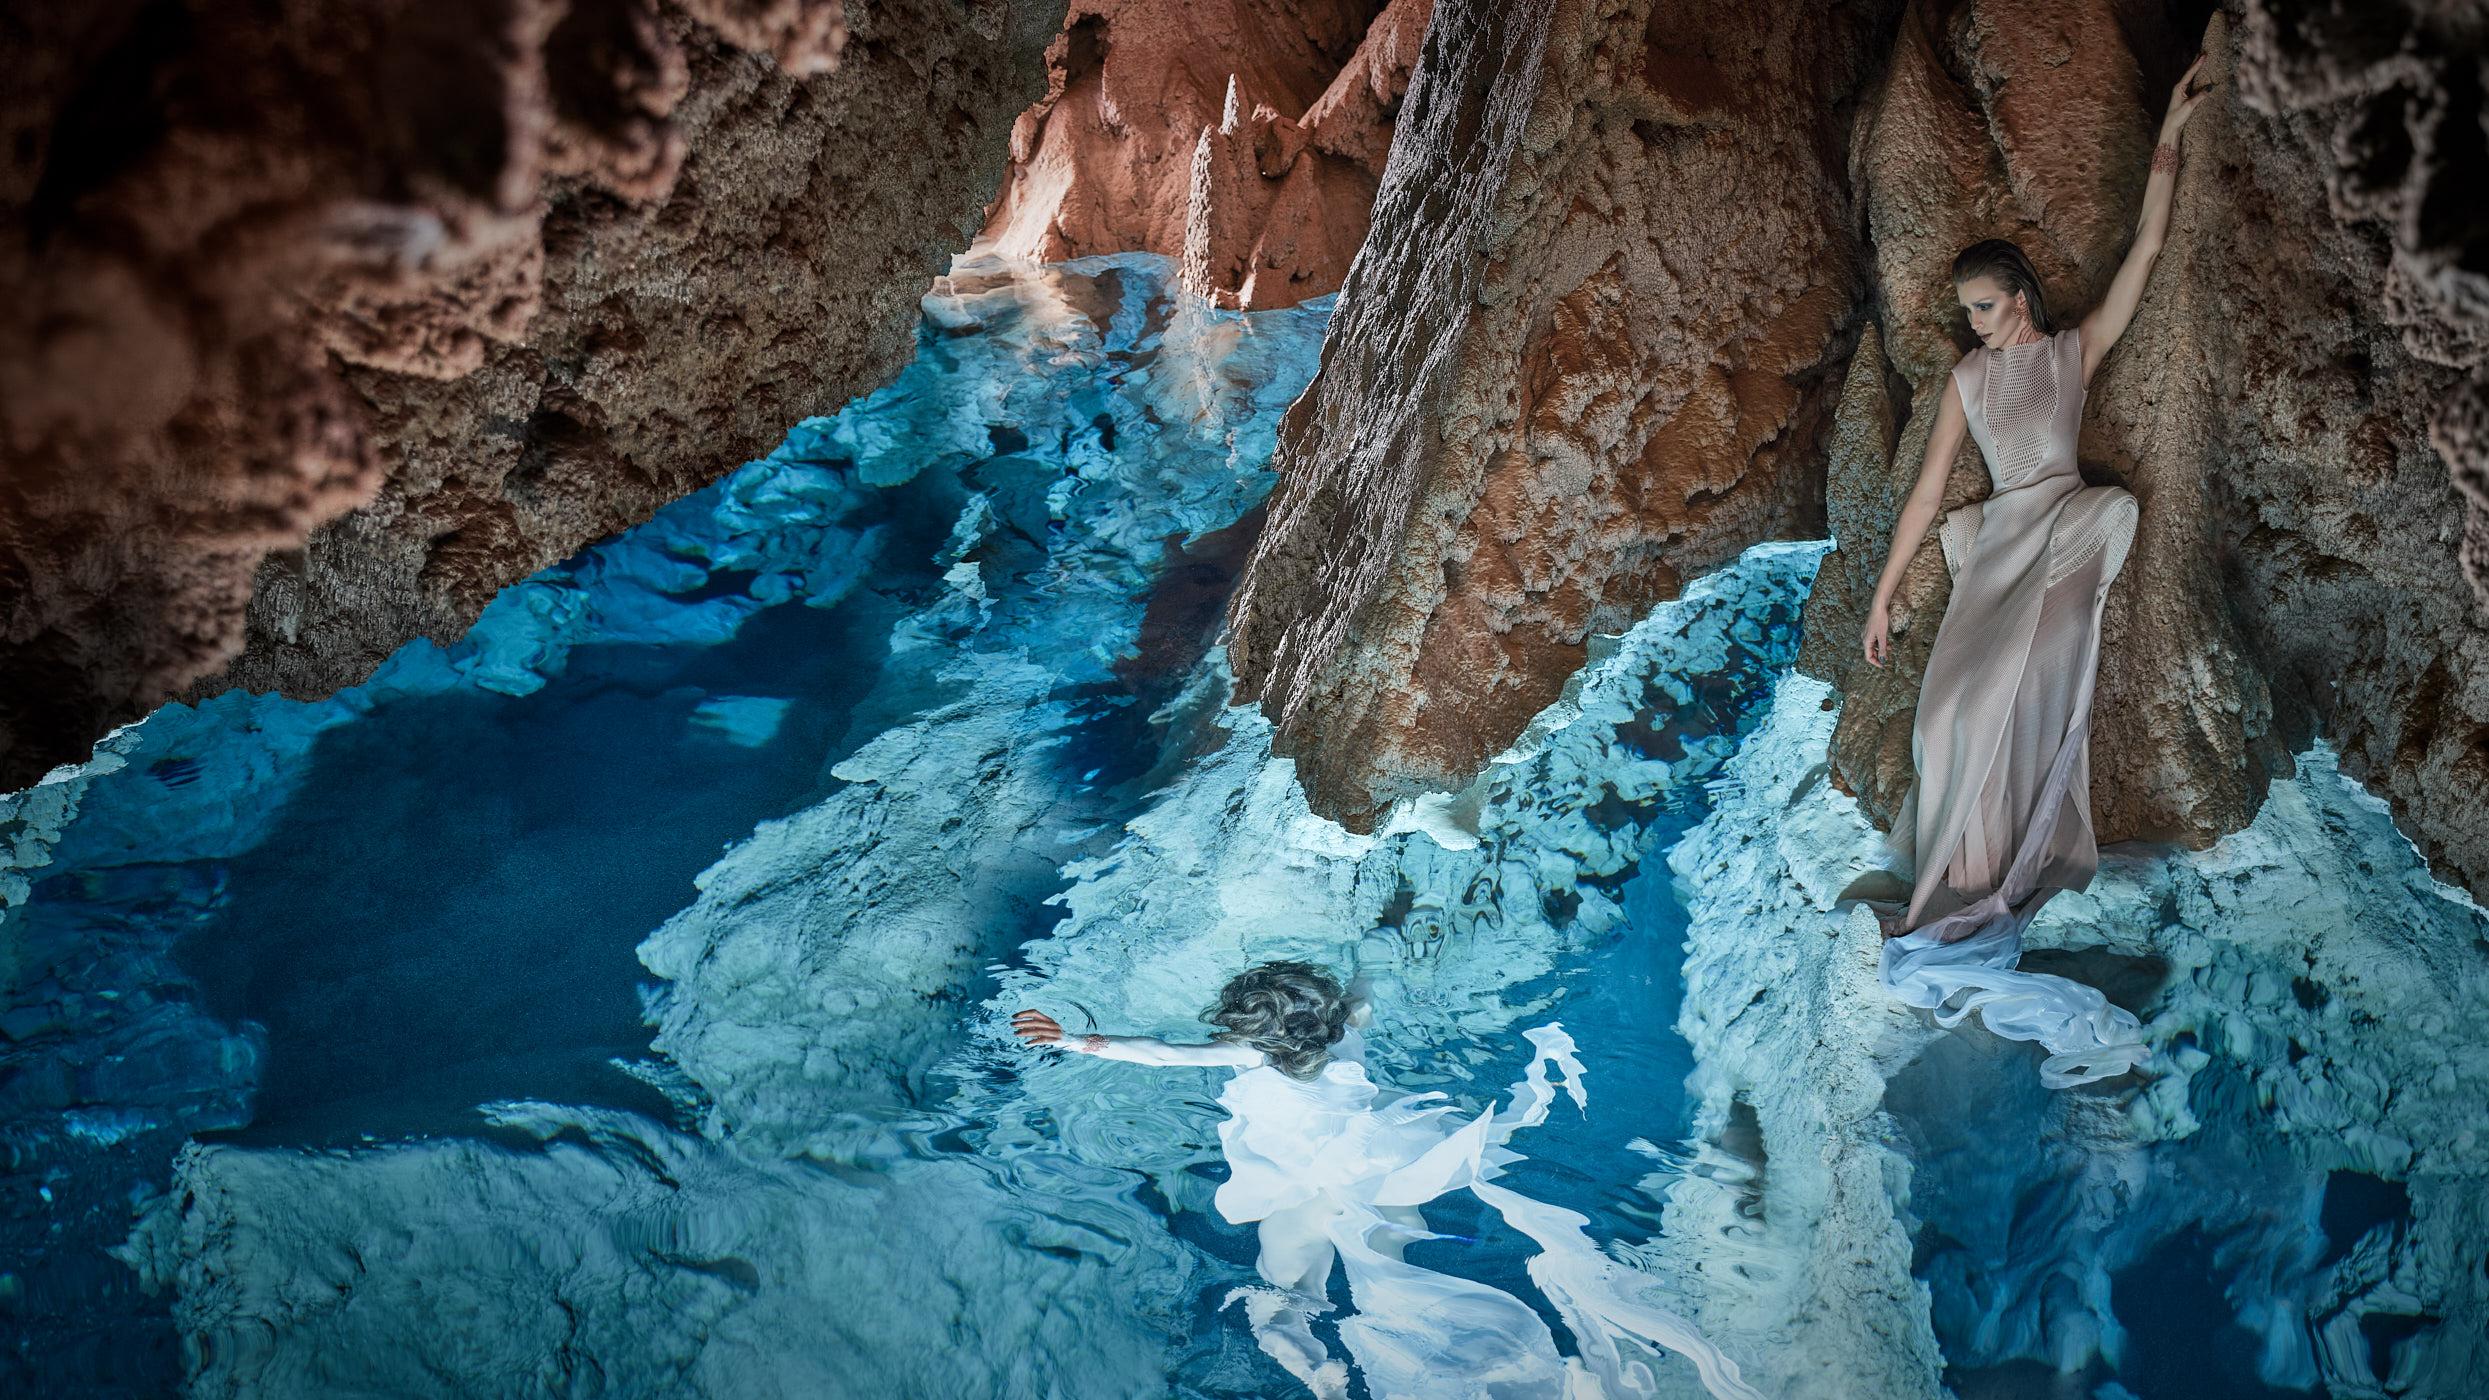 The Naiad Nimphs at Grotta Giusti.